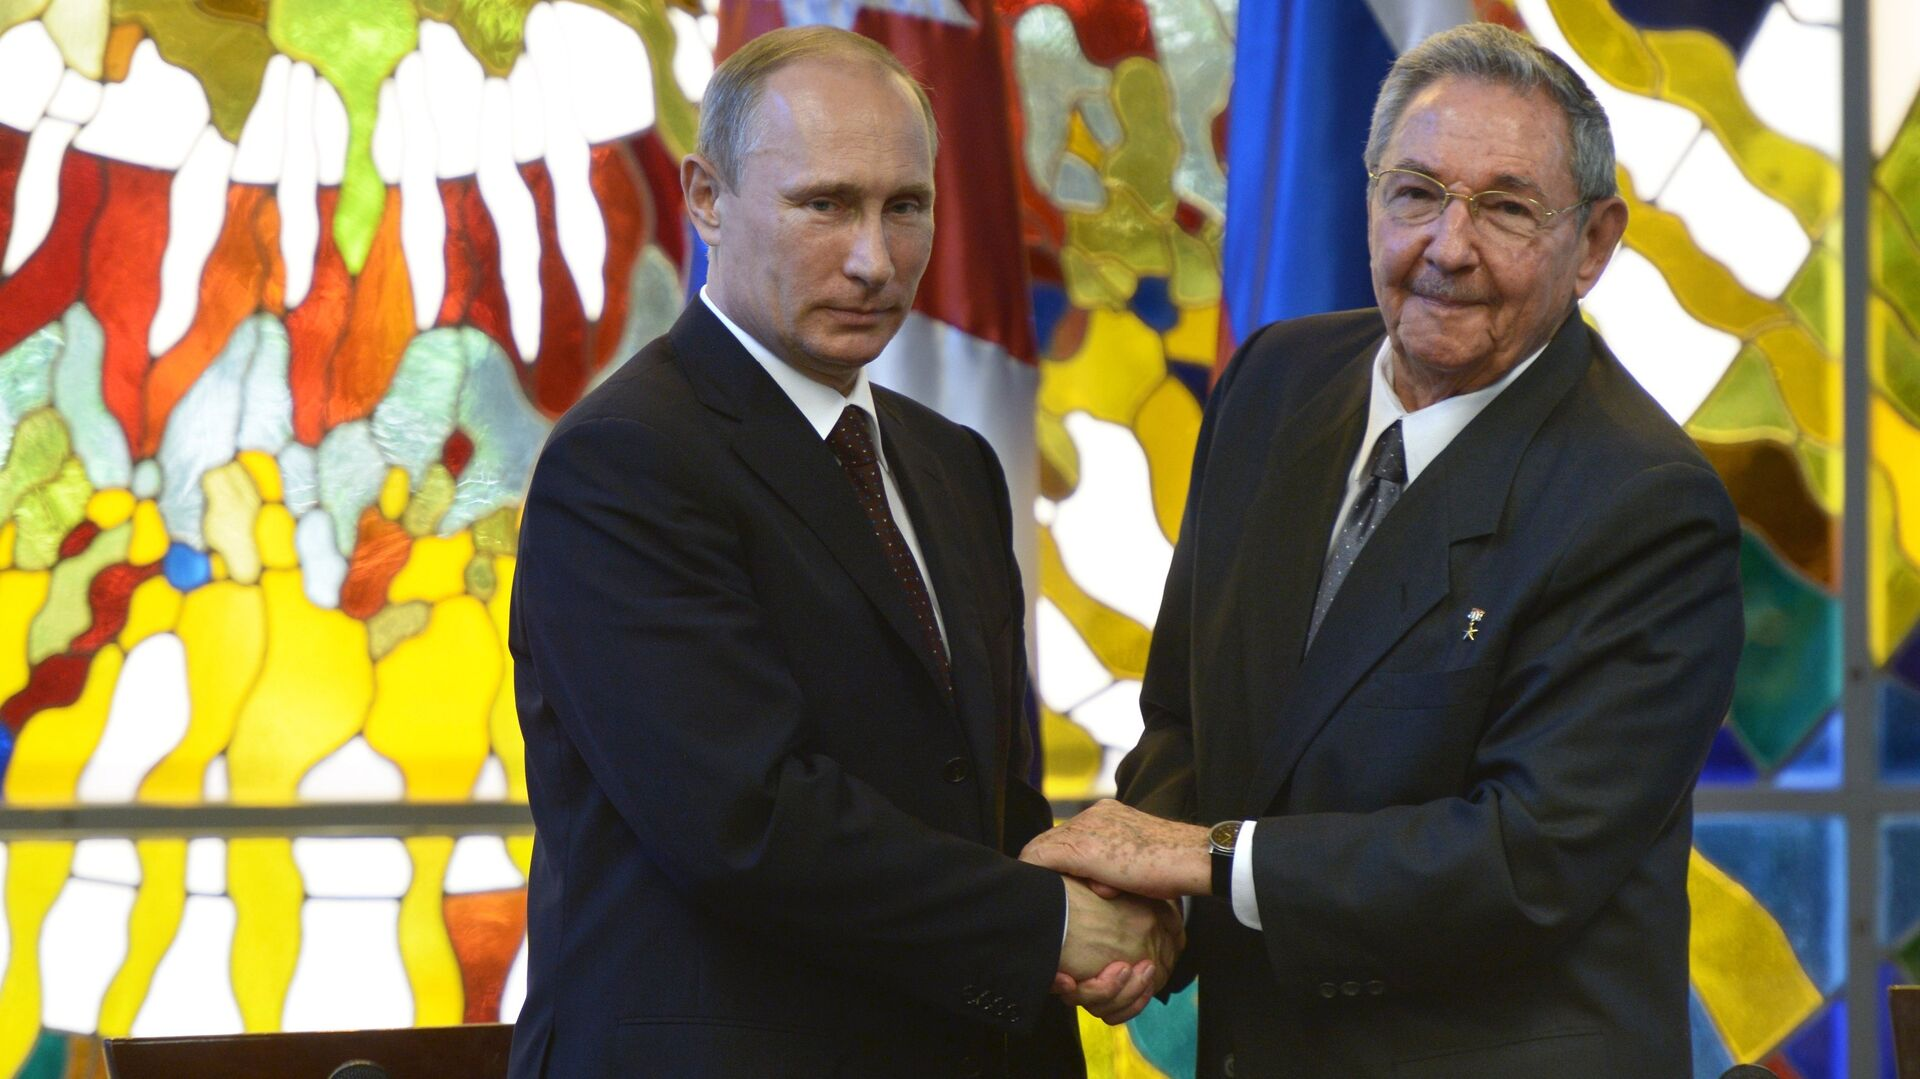 Vladimir Putin a Raúl Castro - Sputnik Česká republika, 1920, 16.04.2021